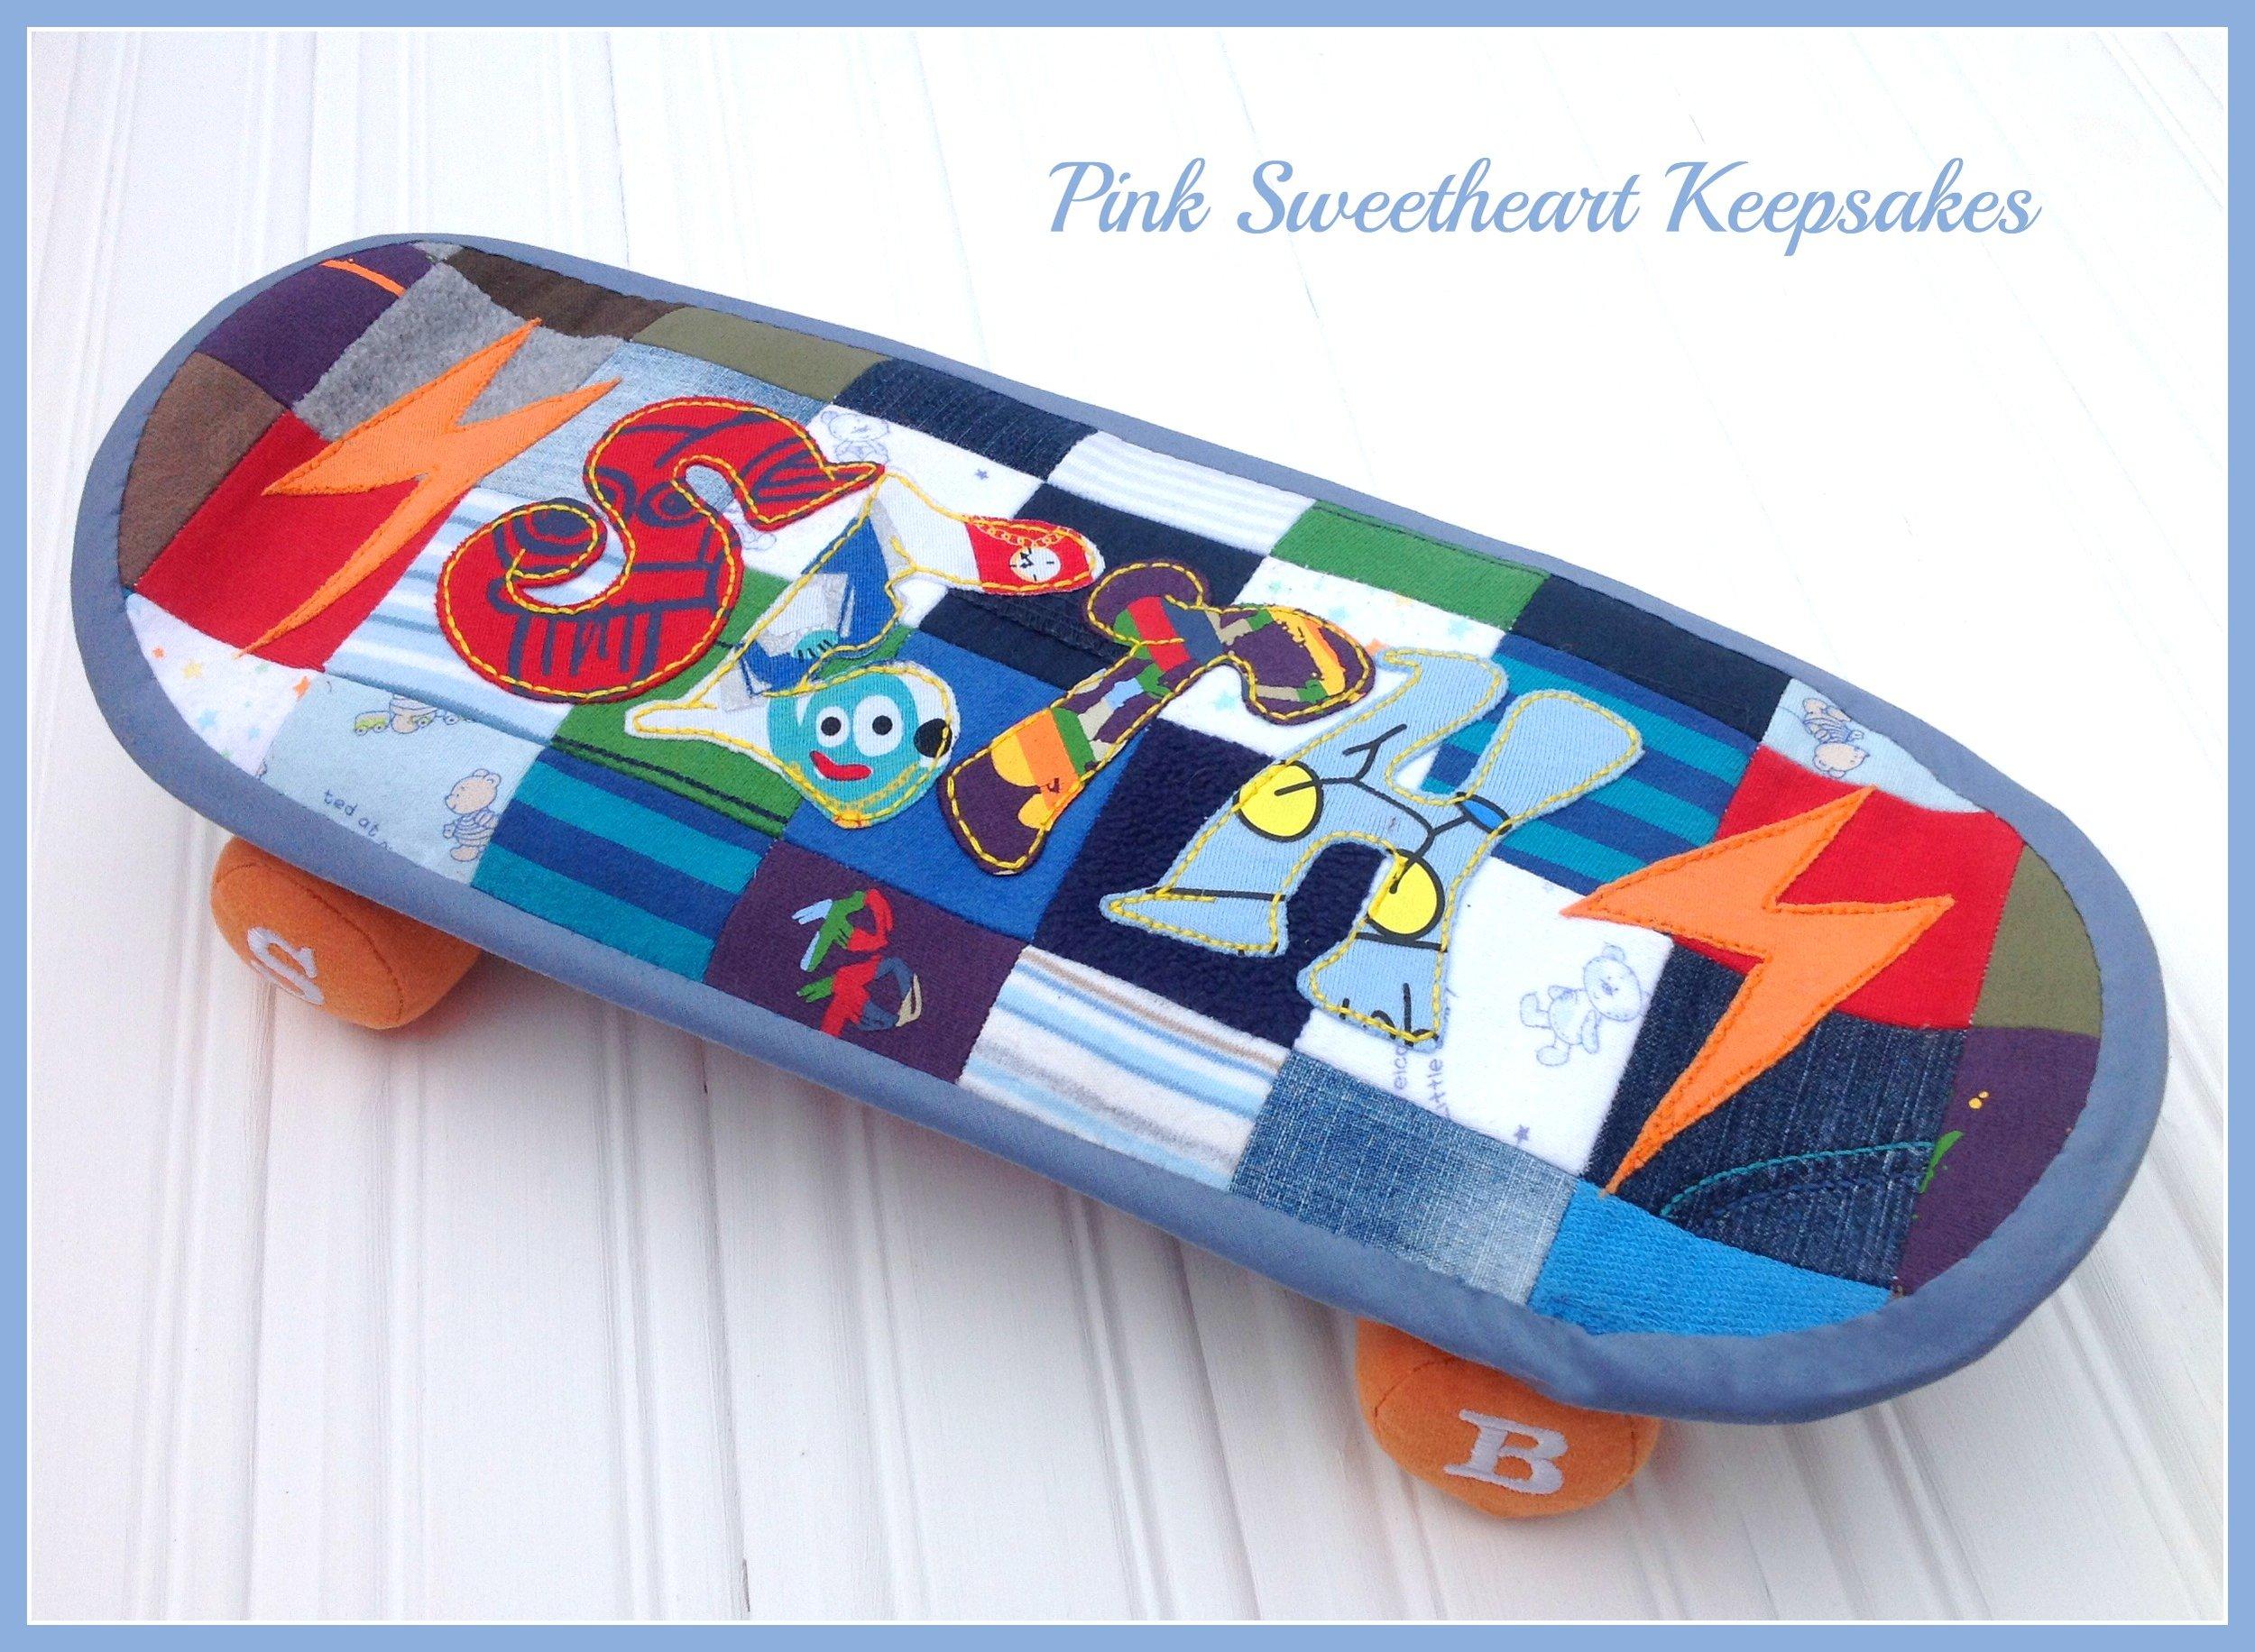 Seth's Skateboard